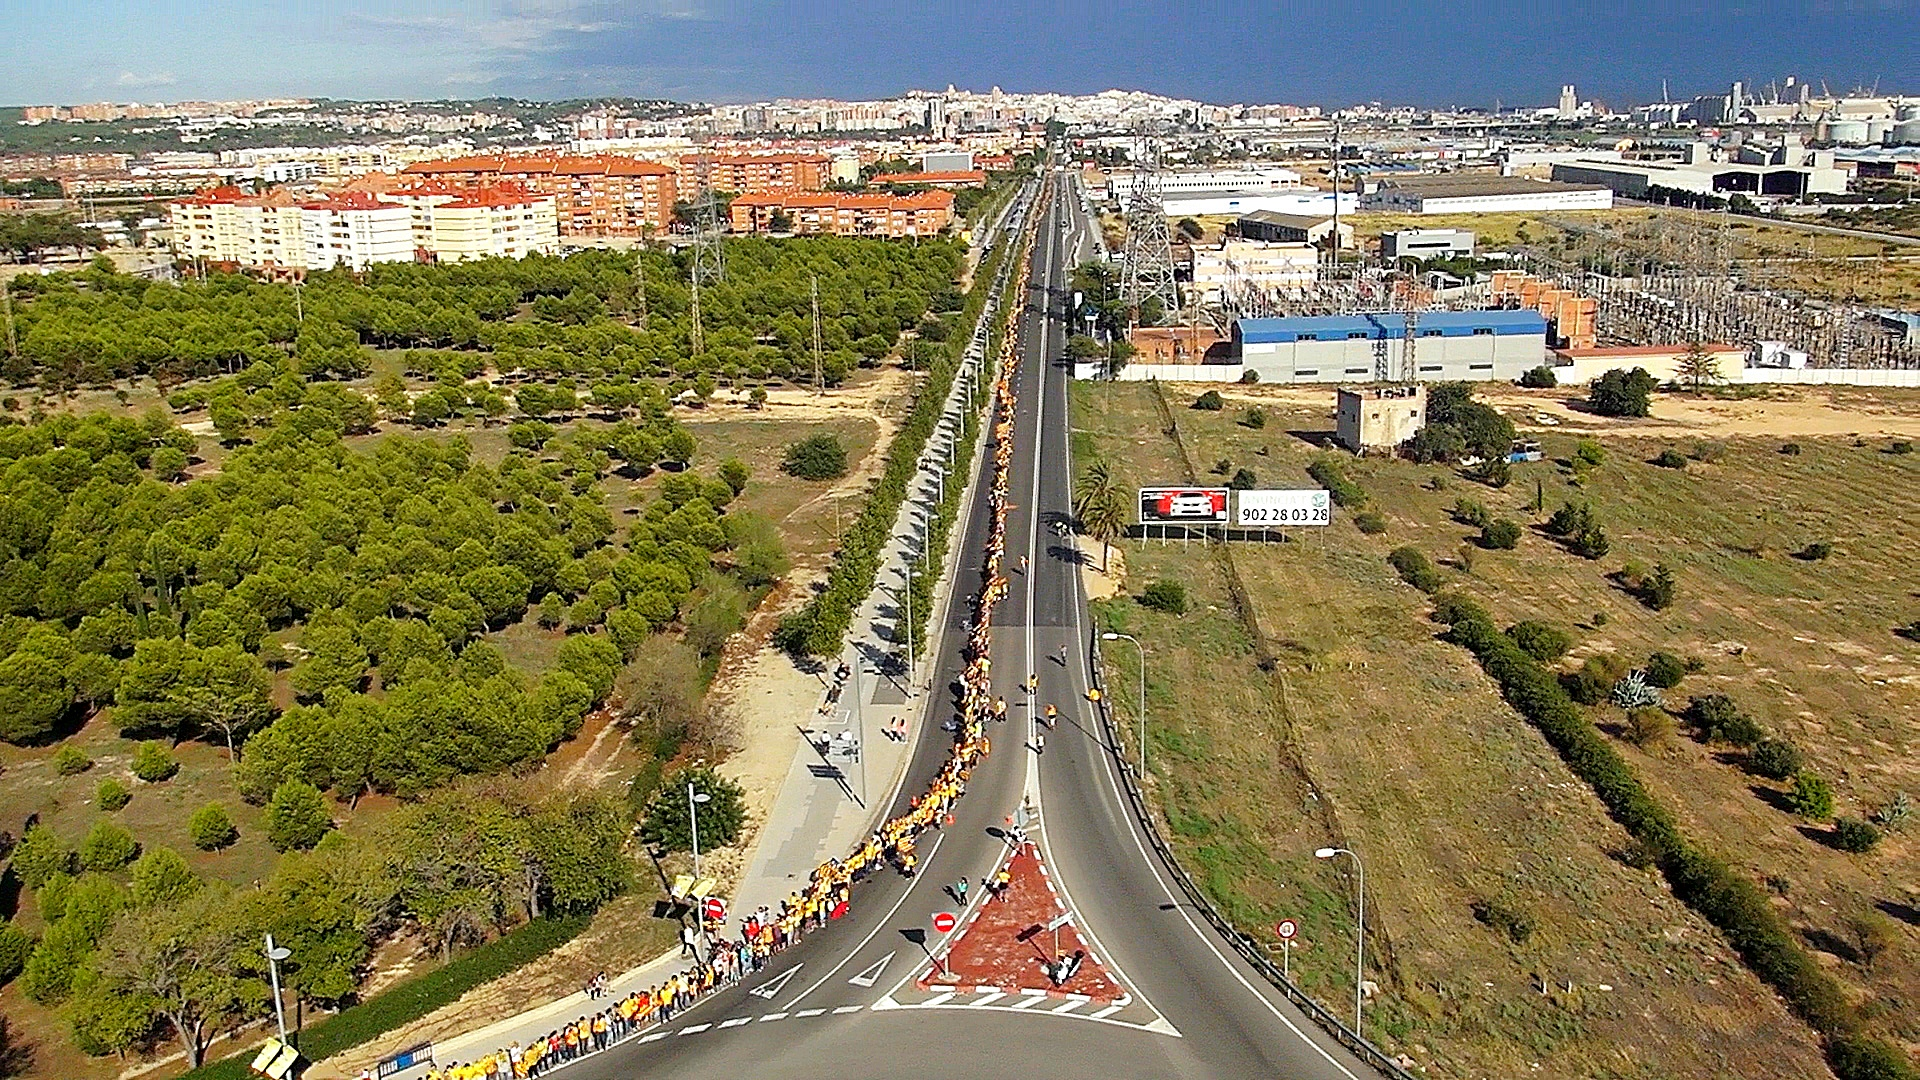 N340 foto aerea via catalana